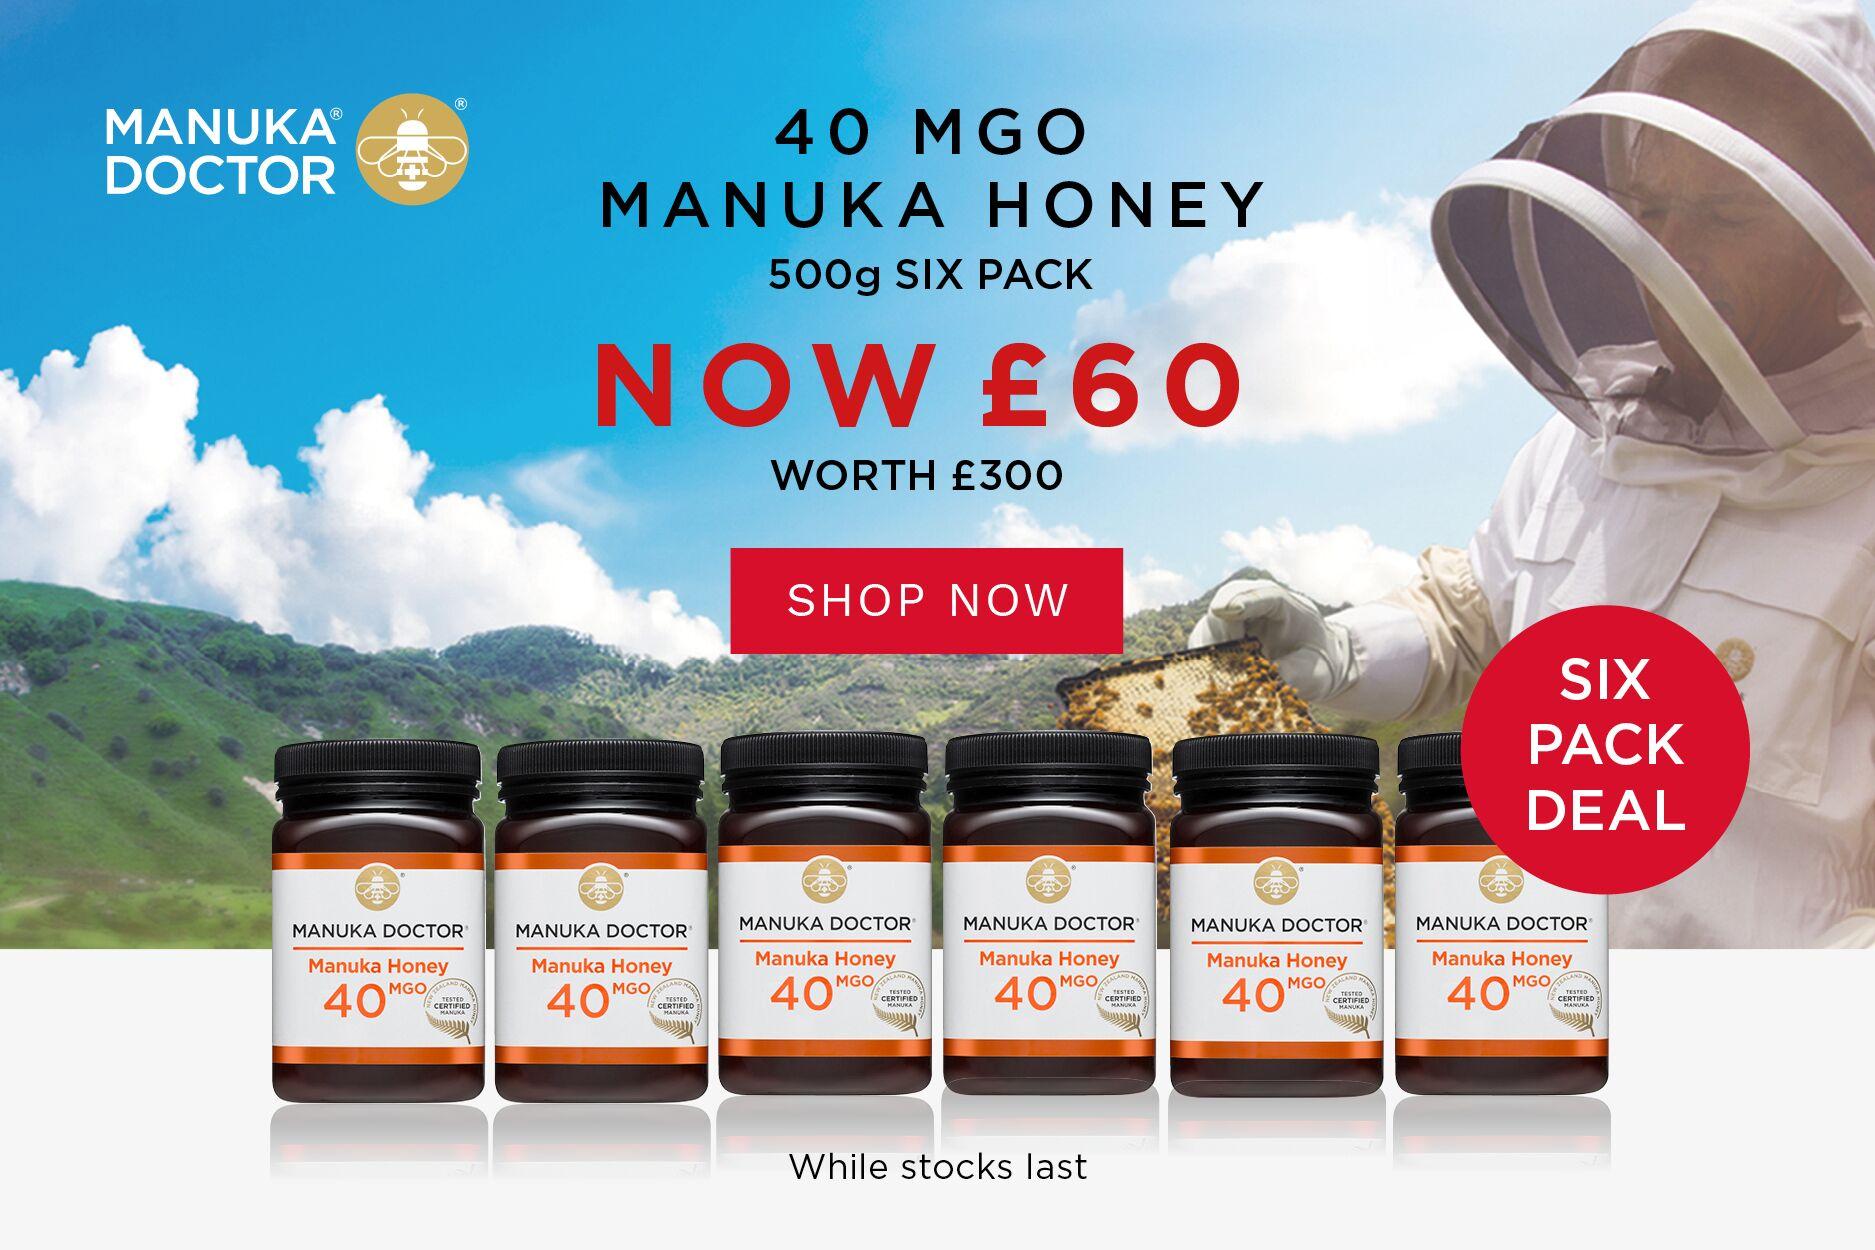 Manuka Doctor 麦卢卡蜂蜜 | 超棒2折, 10镑带走40 MGO养胃蜂蜜!